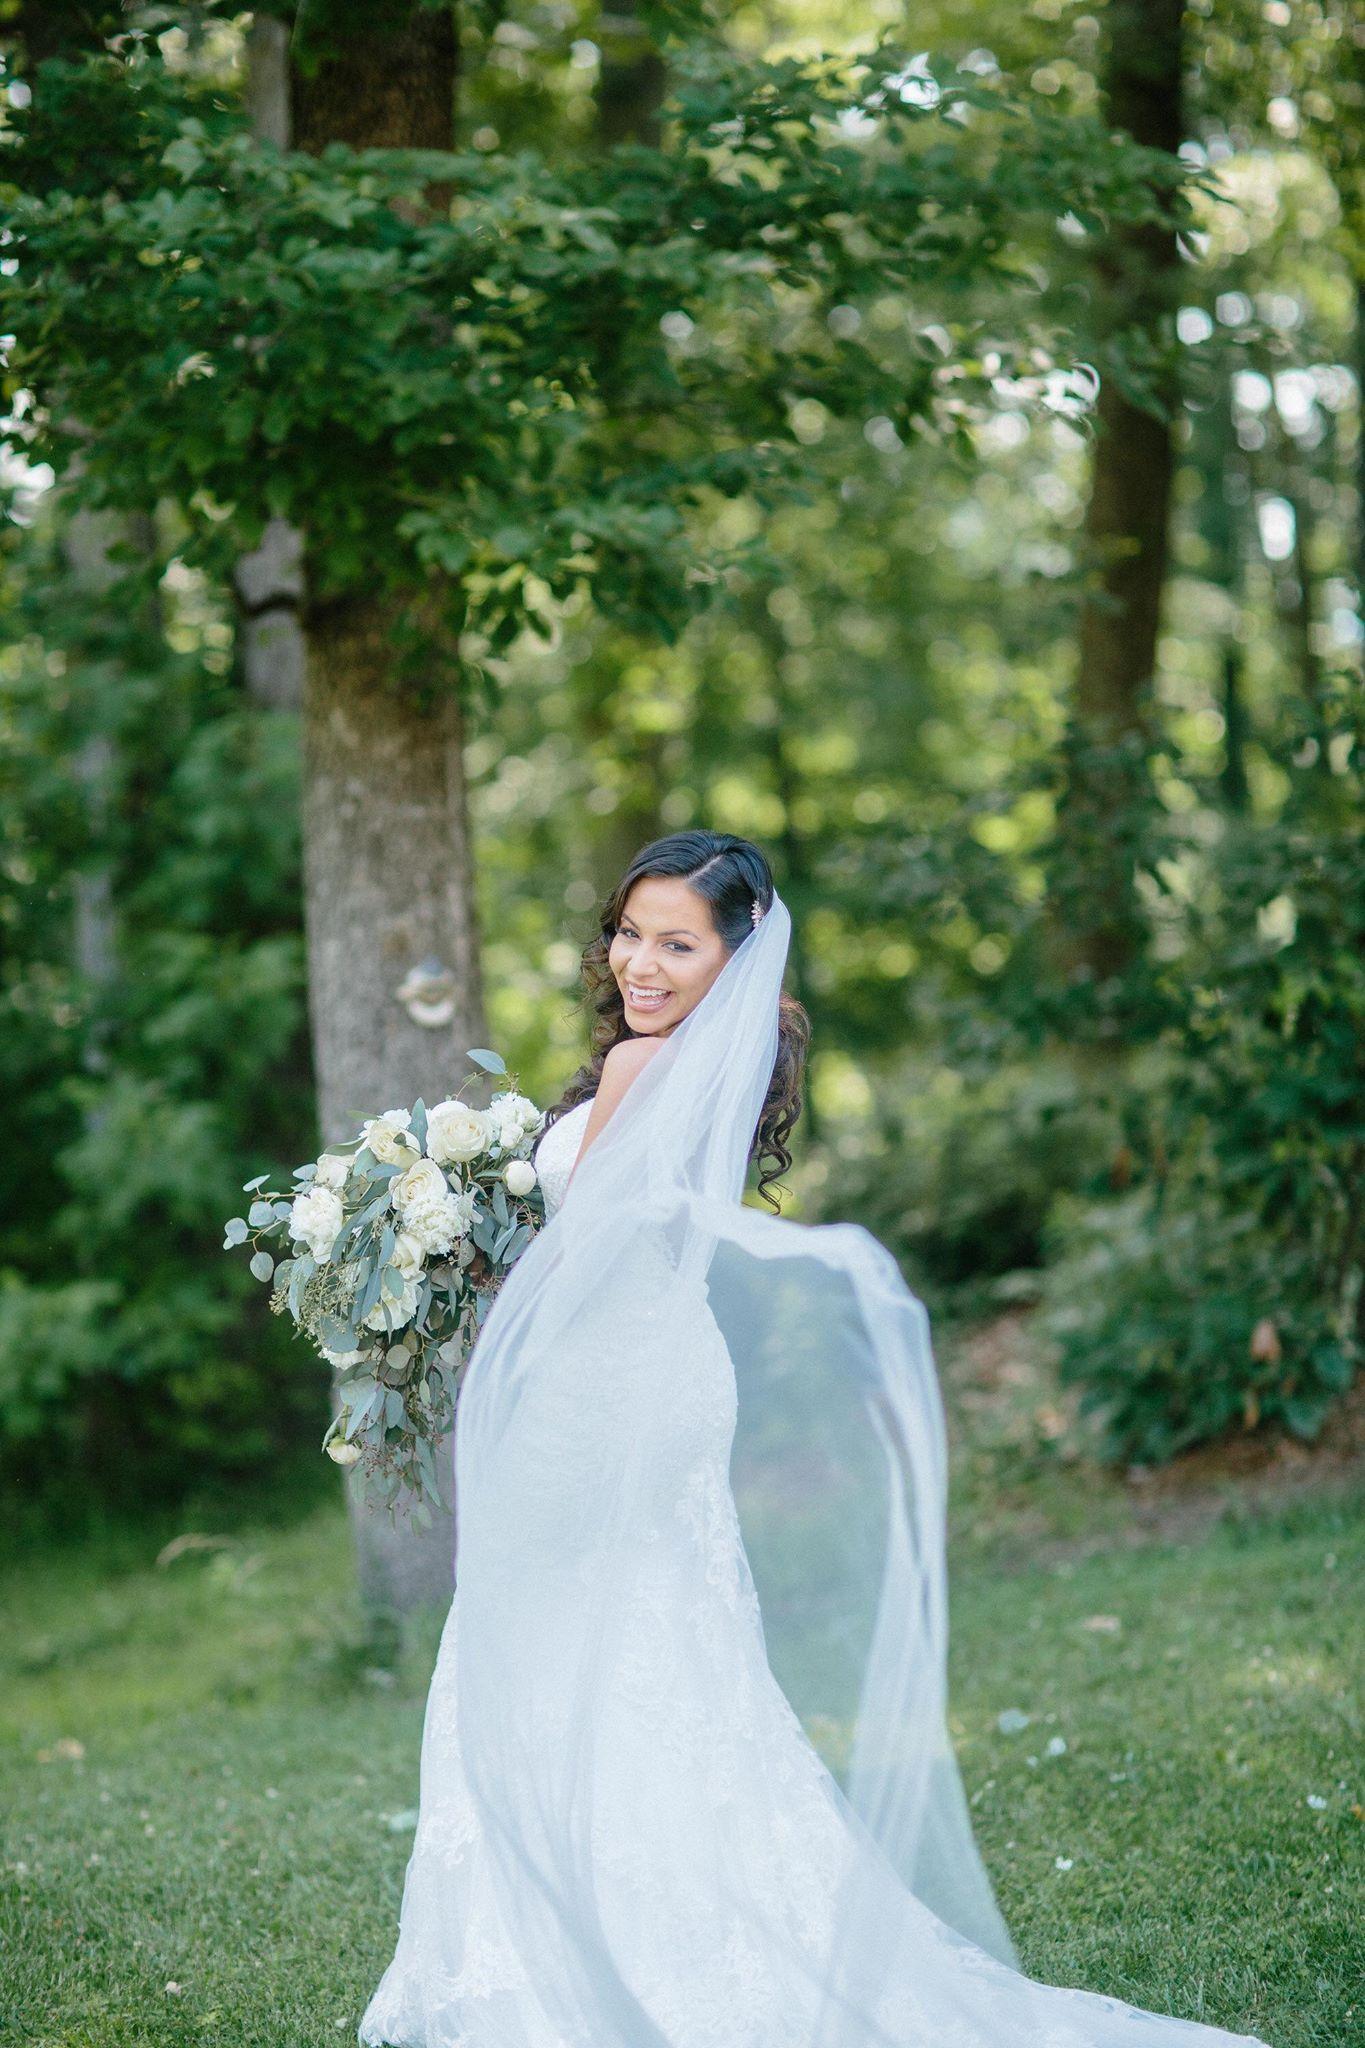 Best Amazon Wedding Veils for Cheap Wedding veils